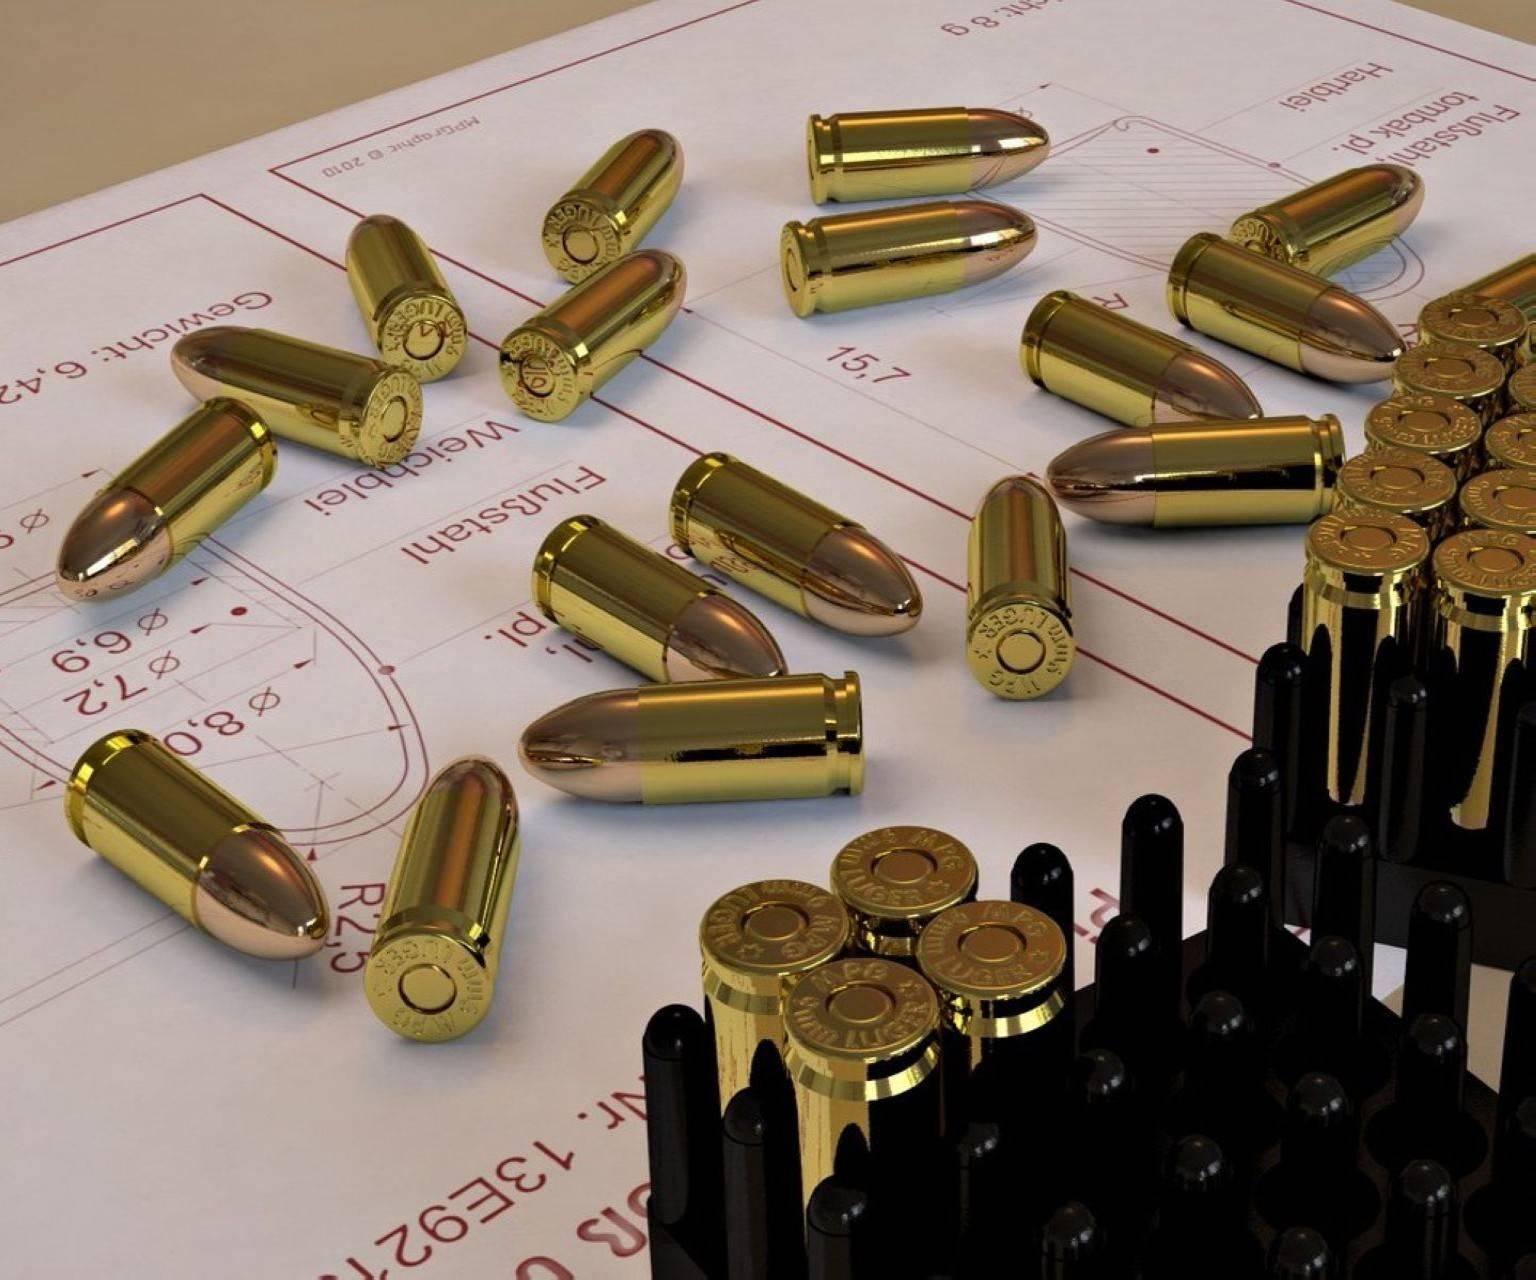 Bullets